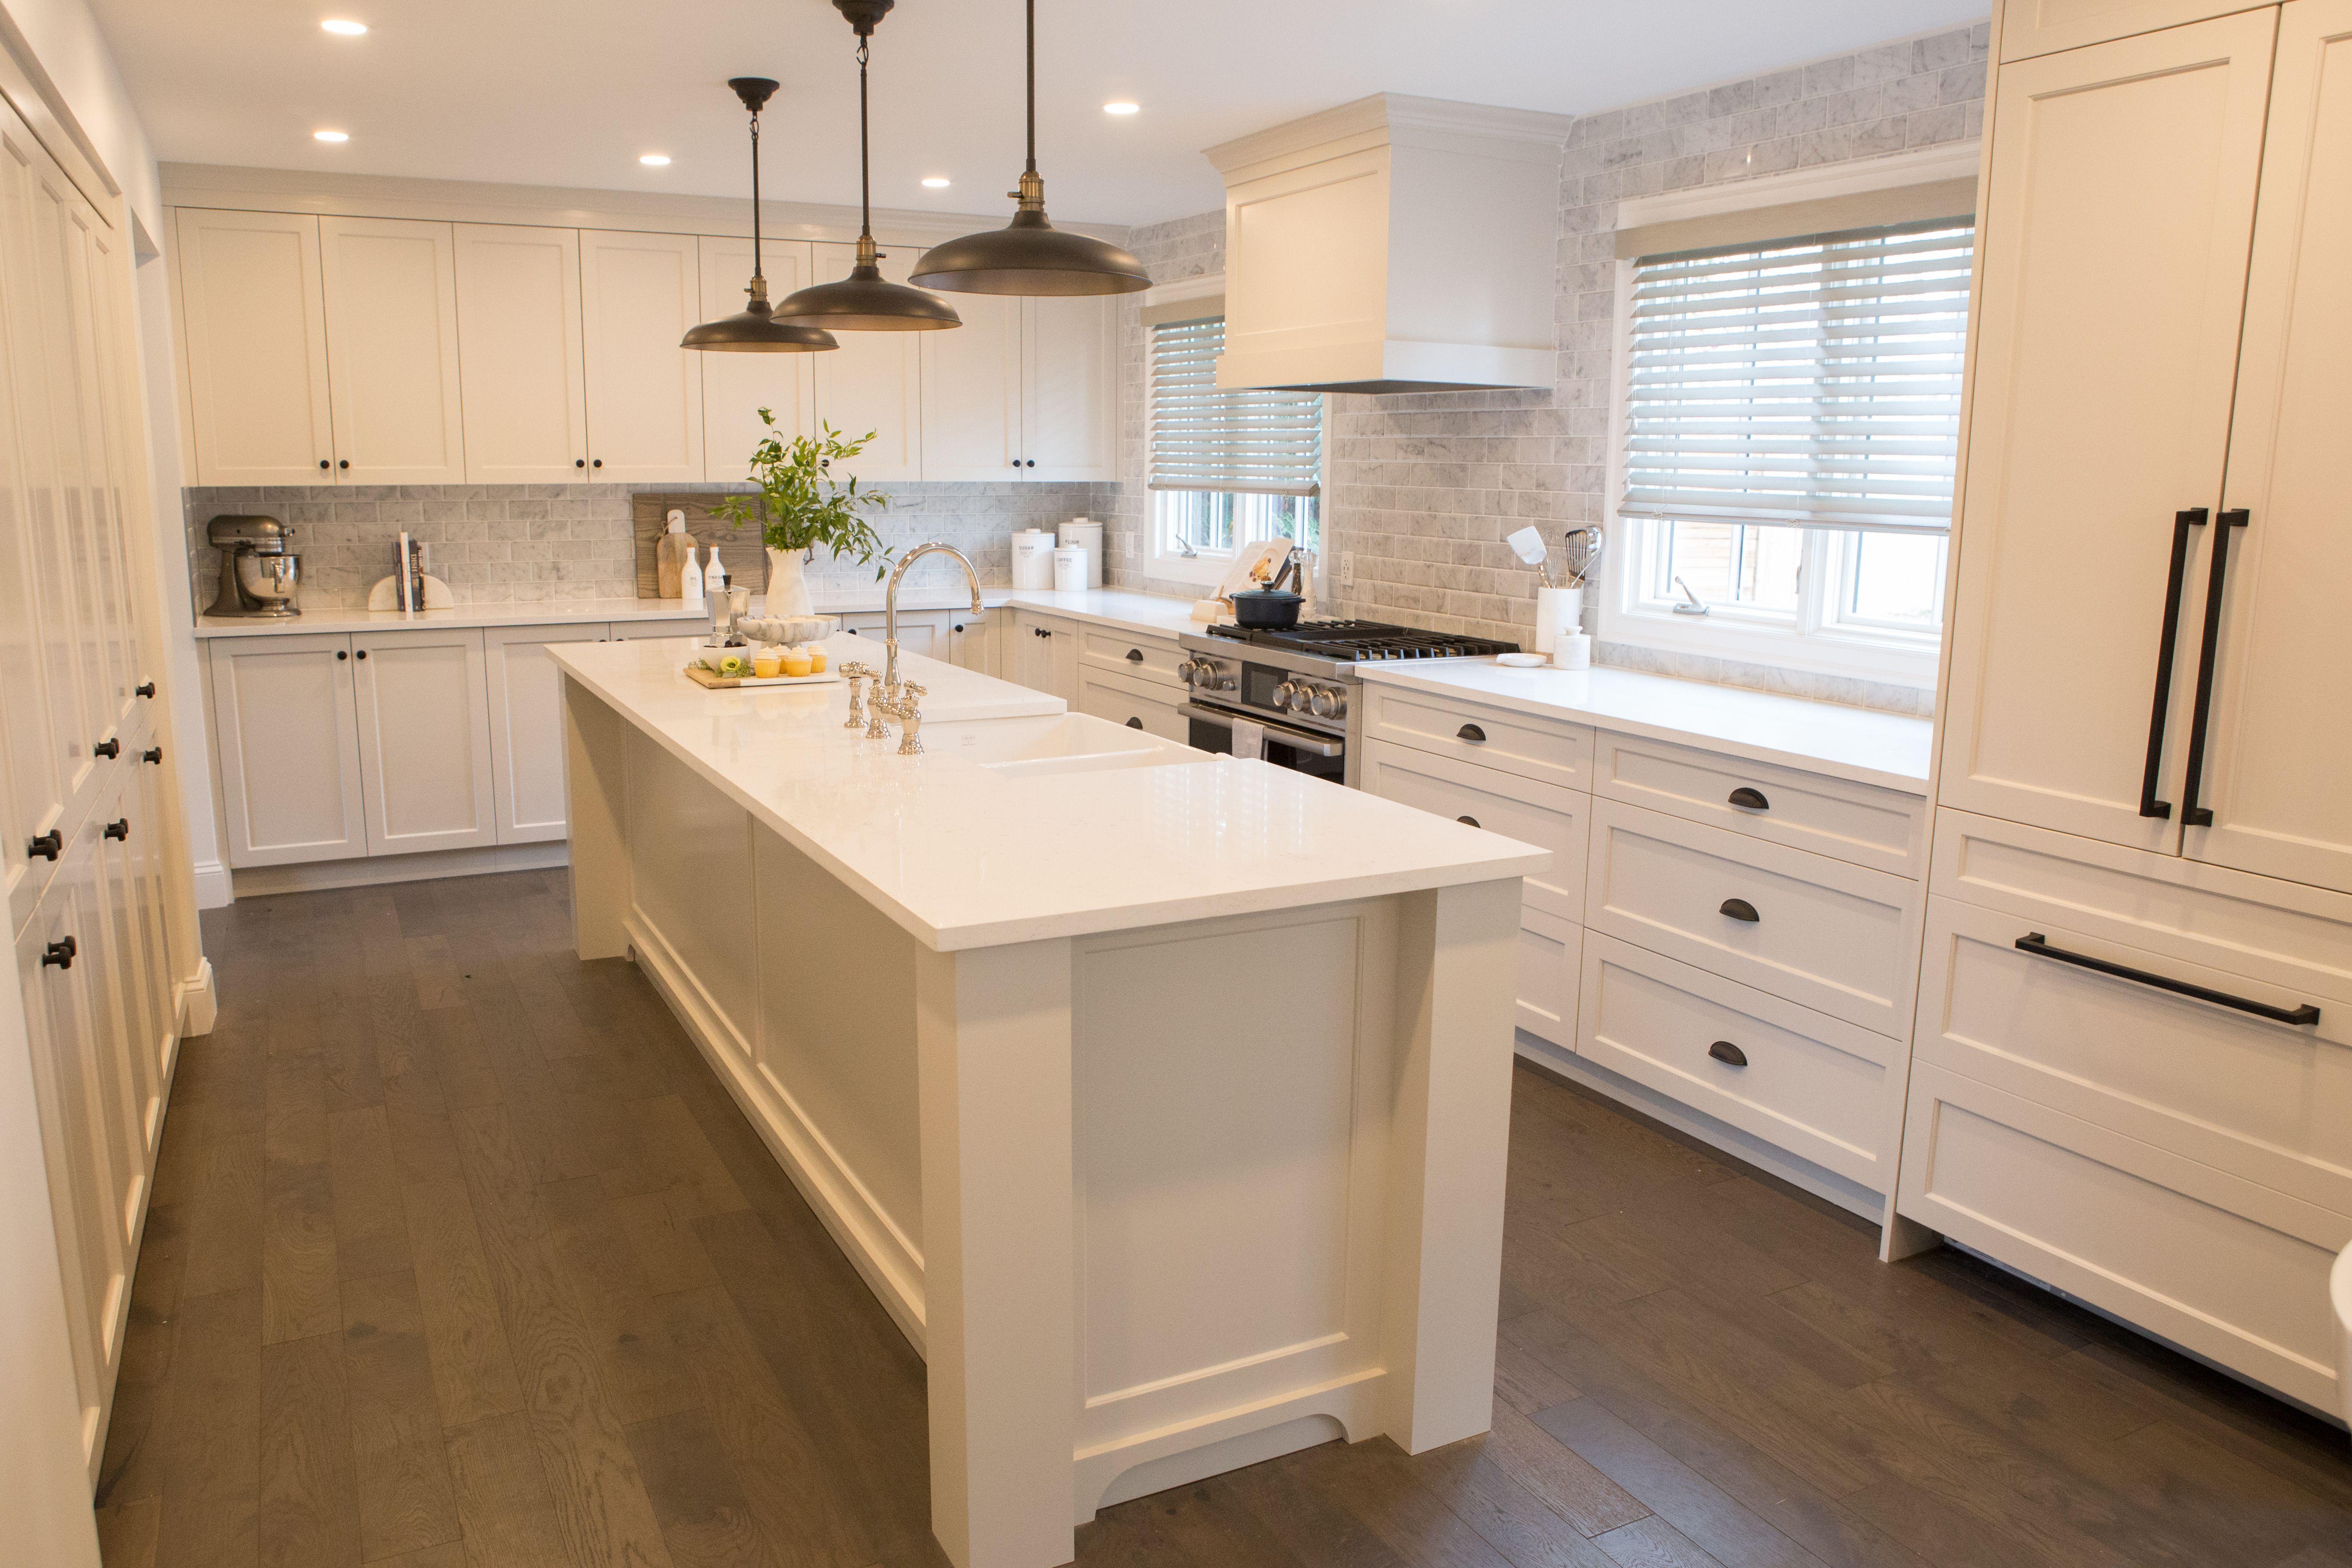 Custom Cabinetry Property Brothers Kitchen Wood Floor Kitchen Kitchen Island Storage